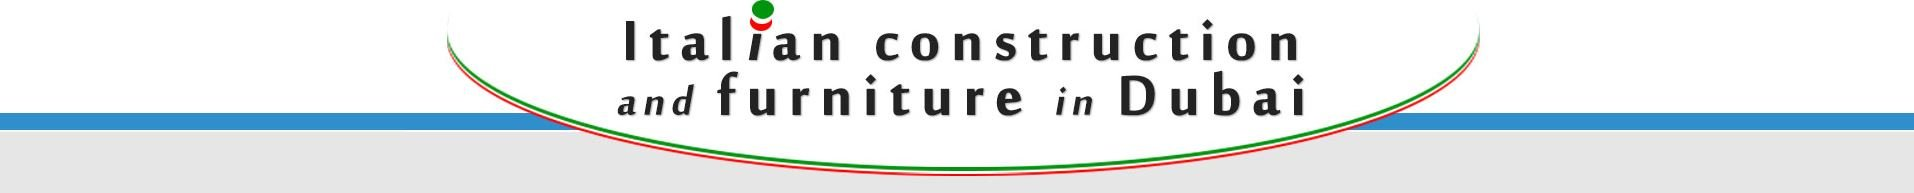 Italian Construction and Furniture in Dubai